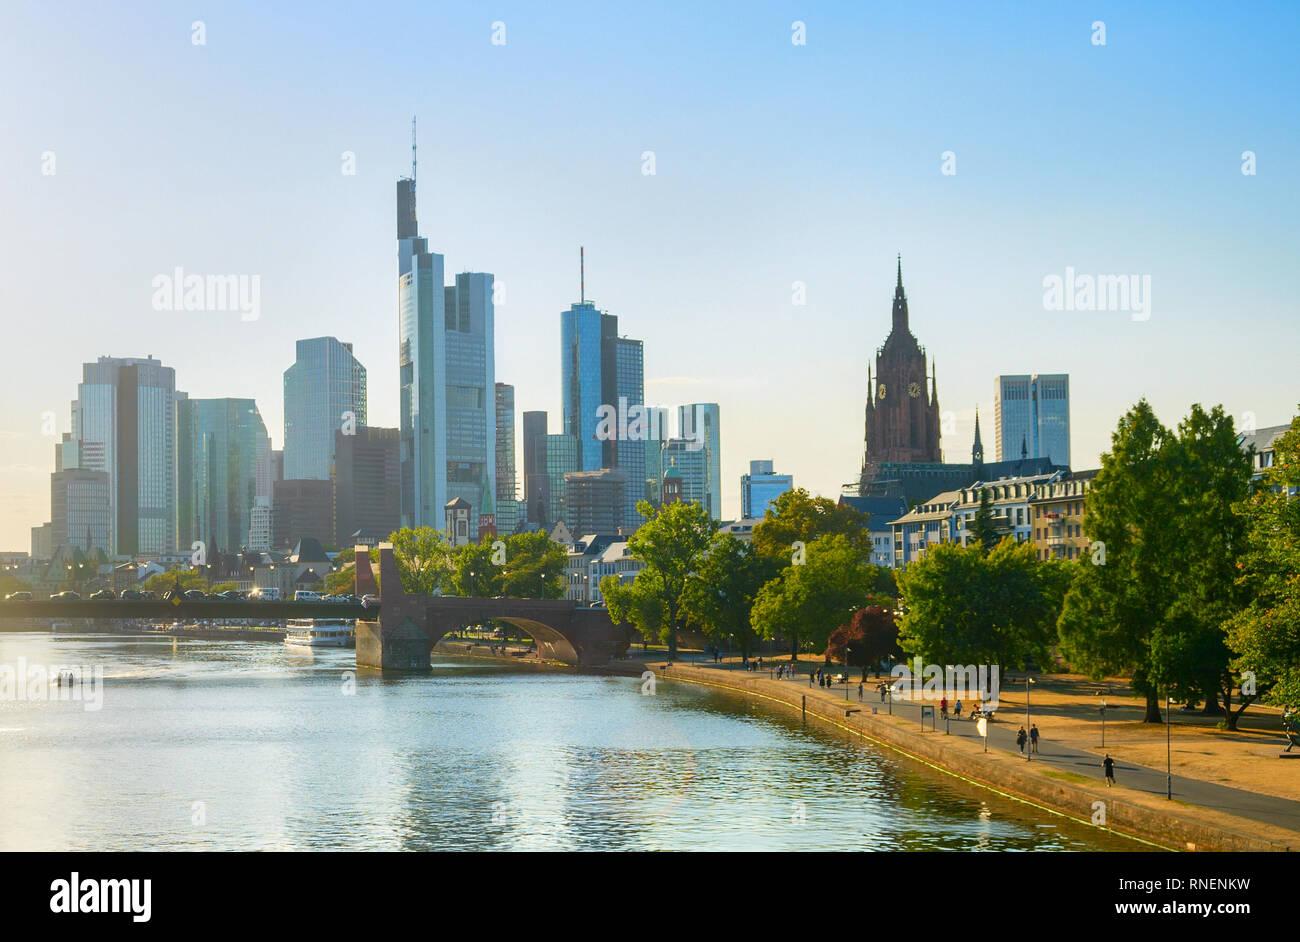 Frankfurt Downtown city cityscape, Frankfurt, Germany Stock Photo